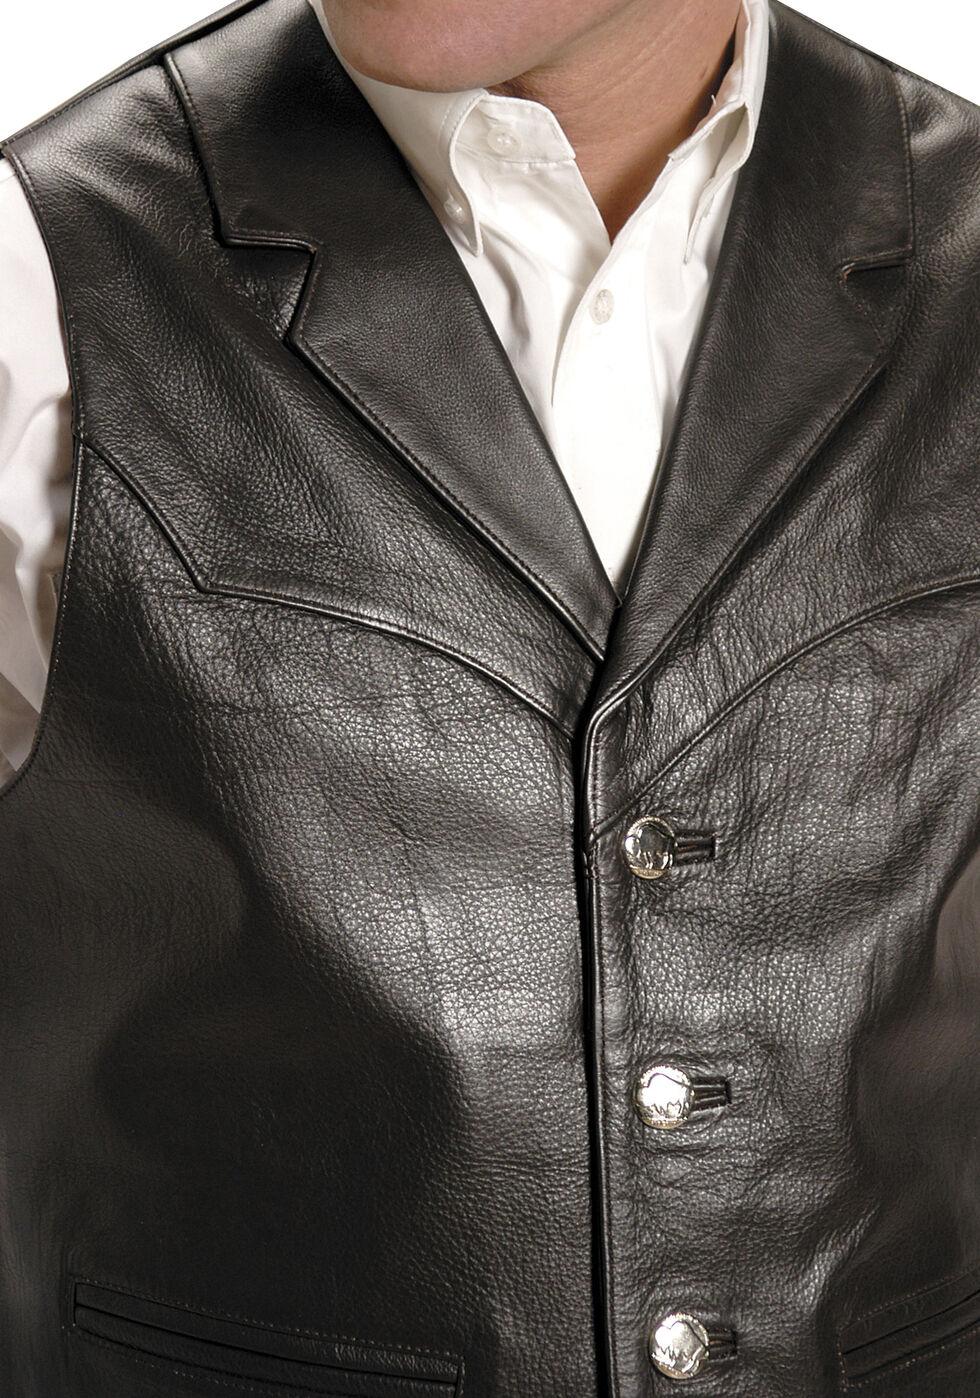 Roper Men's Nappa Notched Collar Leather Vest, Brown, hi-res